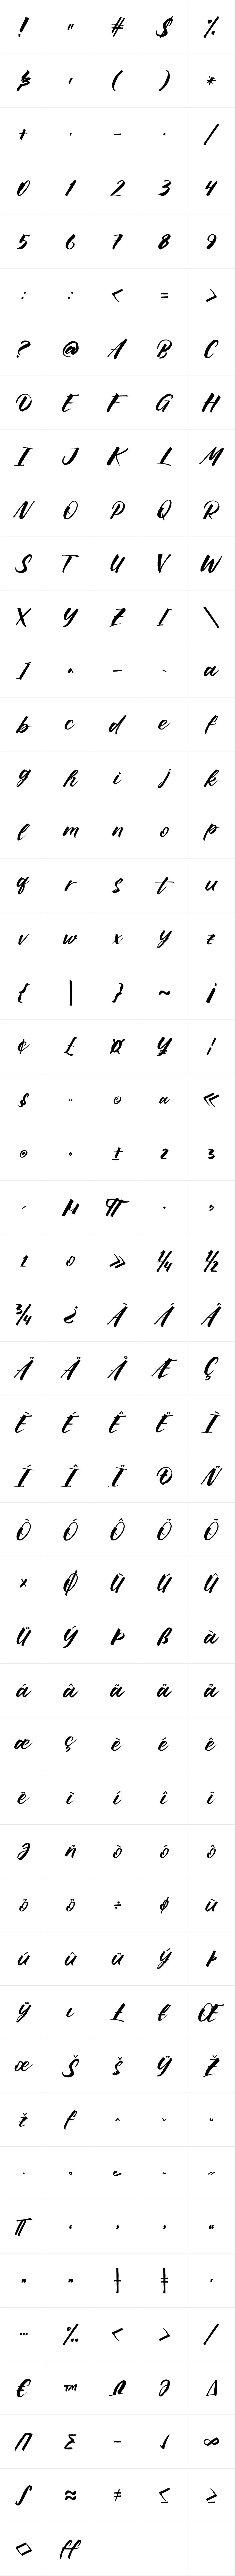 Ruffle Script